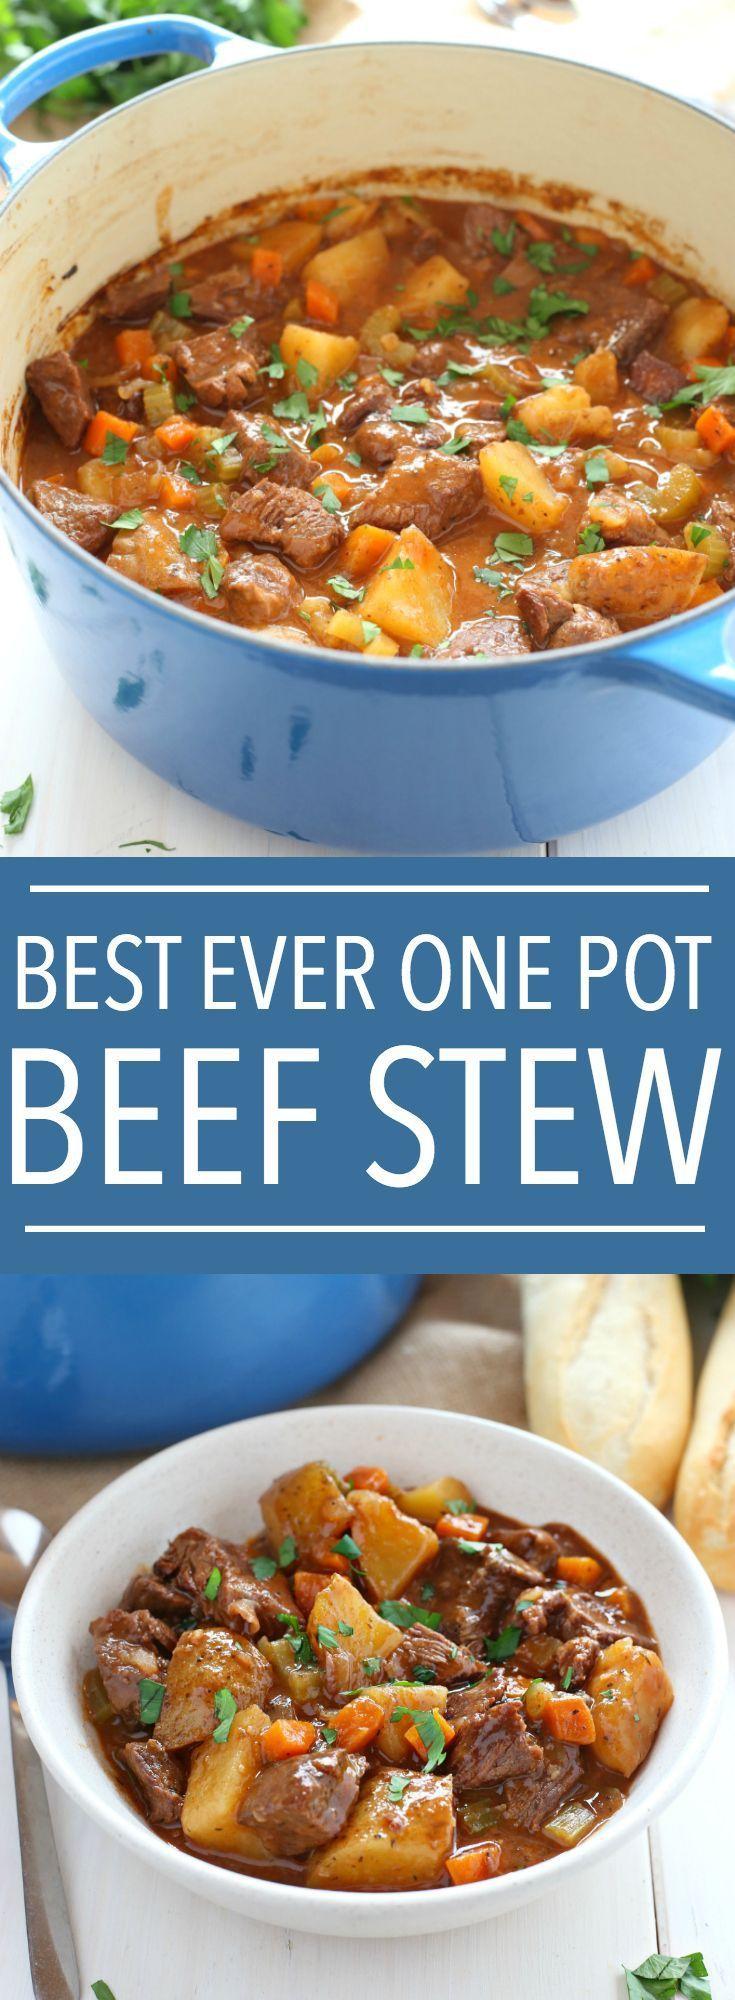 Best Ever One Pot Beef Stew - estofado de ternura